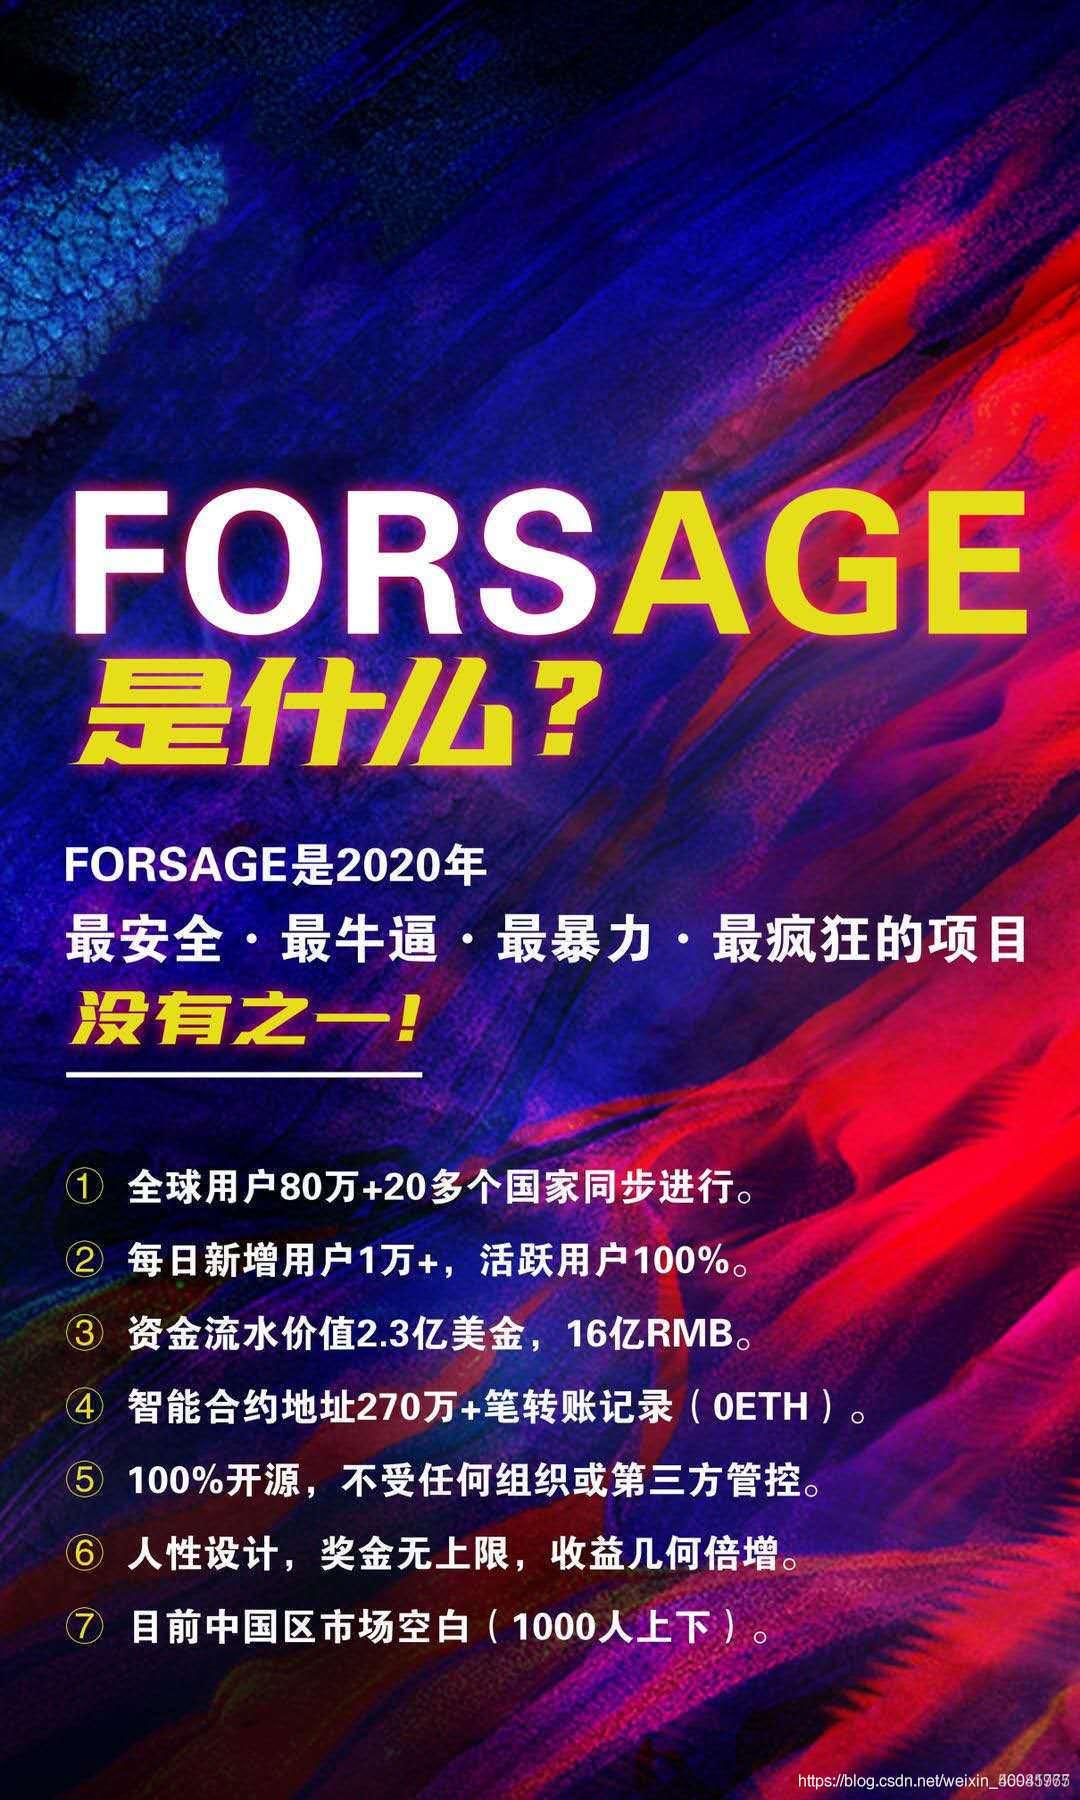 Forsage智能合约玩法介绍weixin46941767的博客-